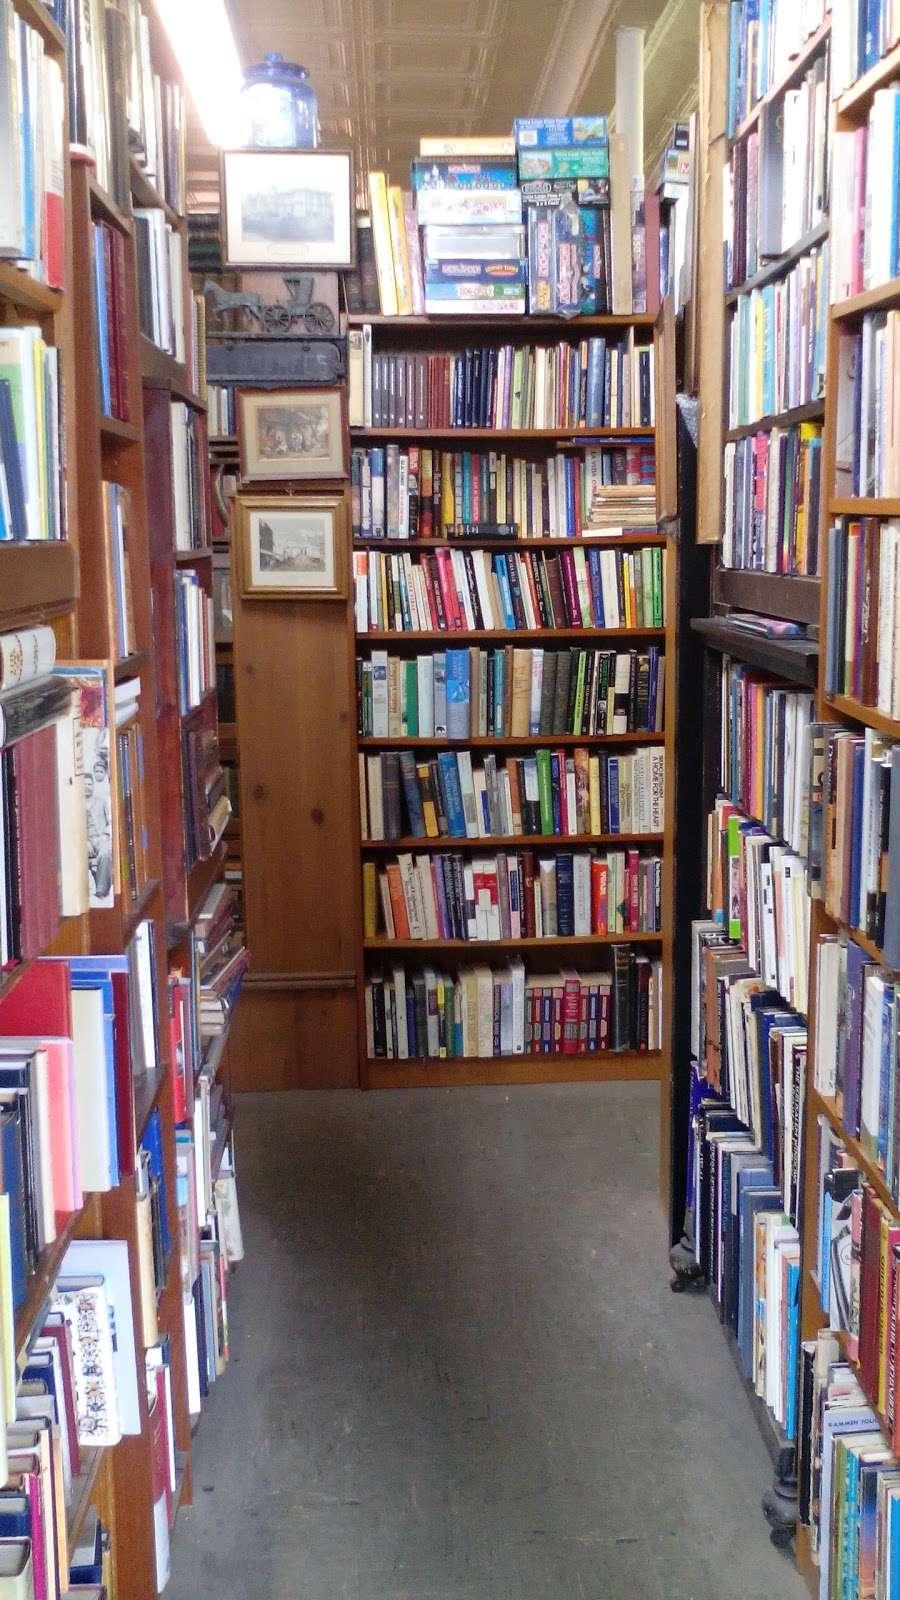 BRIER ROSE BOOKS - book store    Photo 4 of 7   Address: 450 Cedar Ln, Teaneck, NJ 07666, USA   Phone: (201) 836-5500